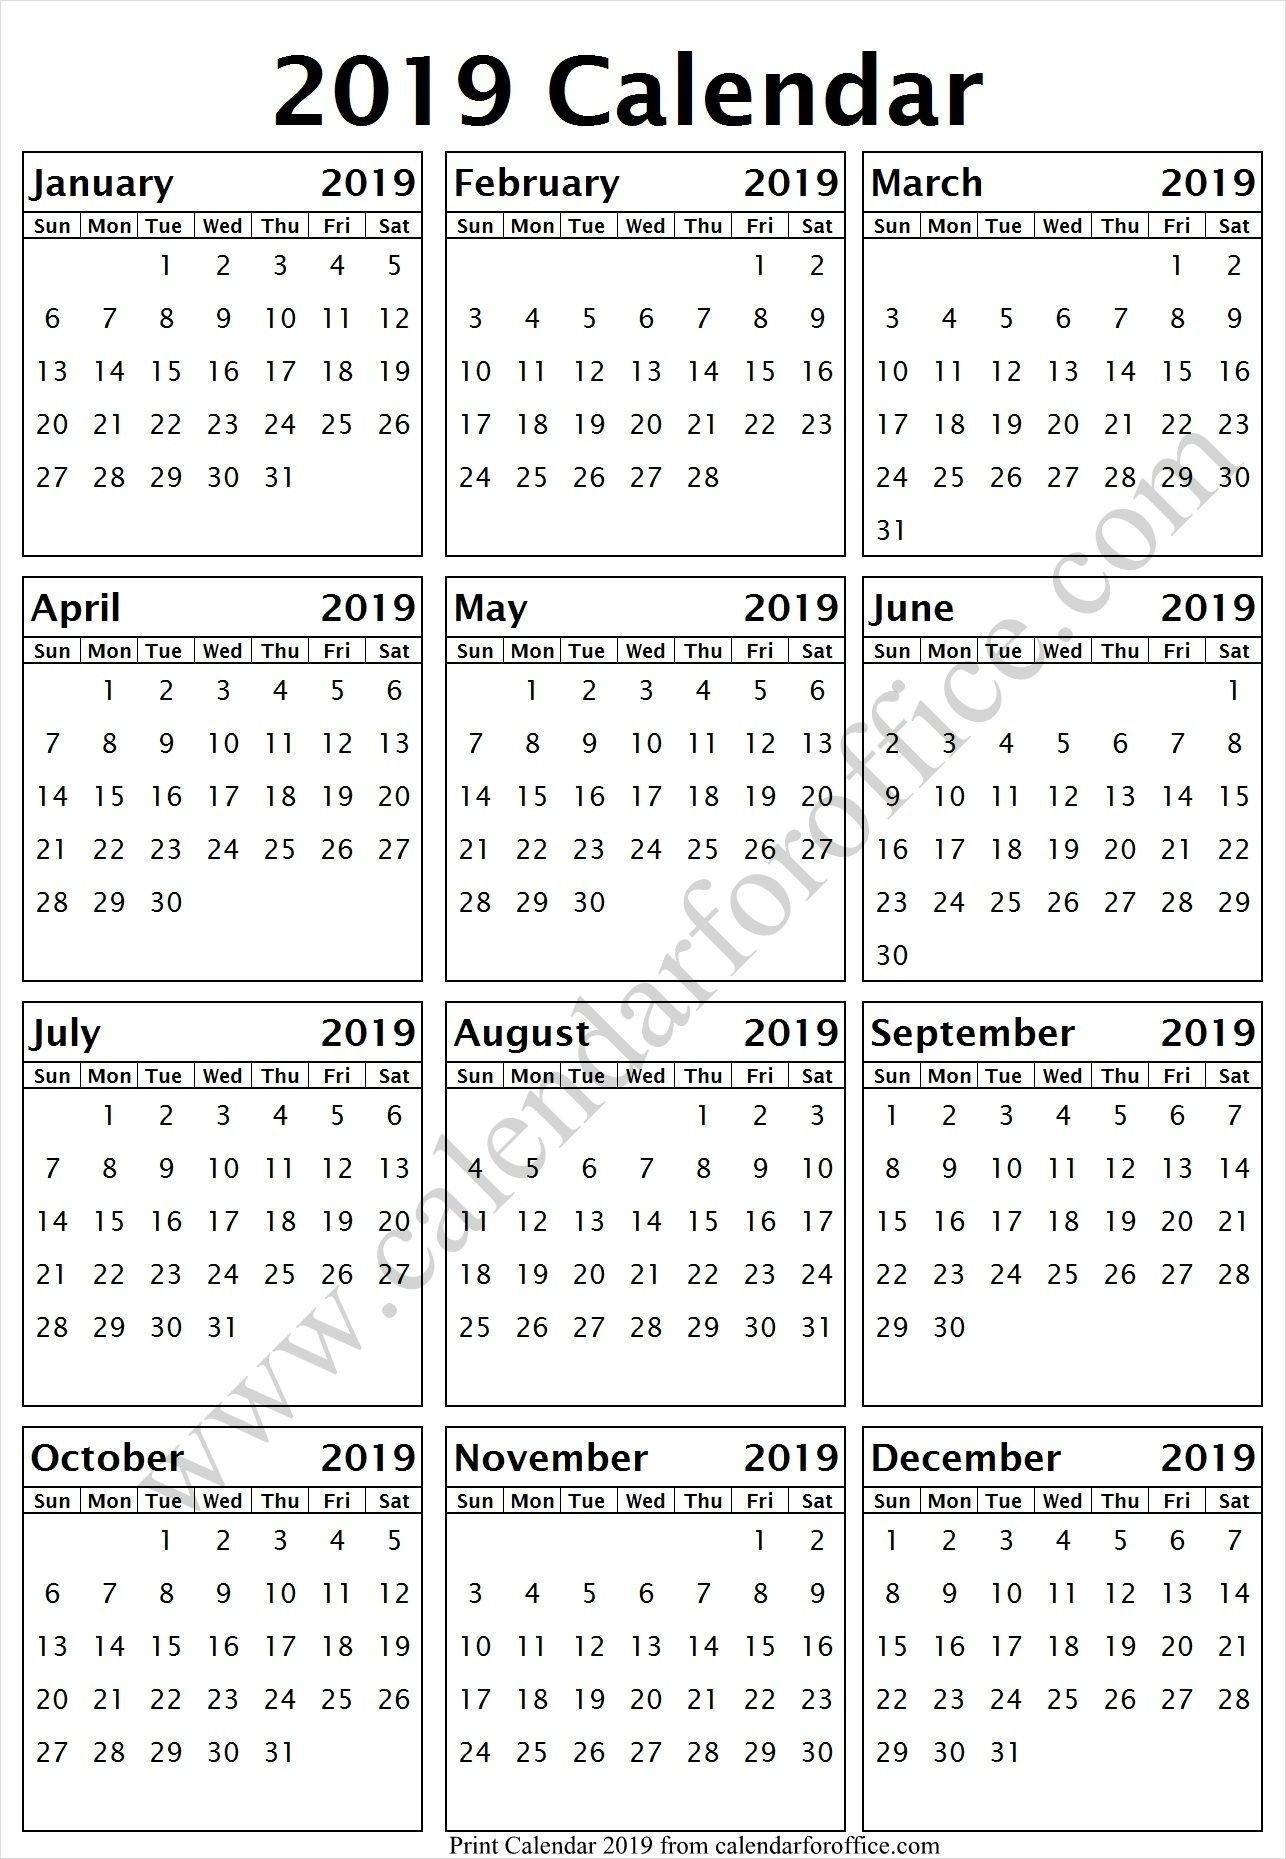 Day Calendar 2019 Sri Lanka   2019 Yearly Calendar   Pinterest Calendar 2019 Days